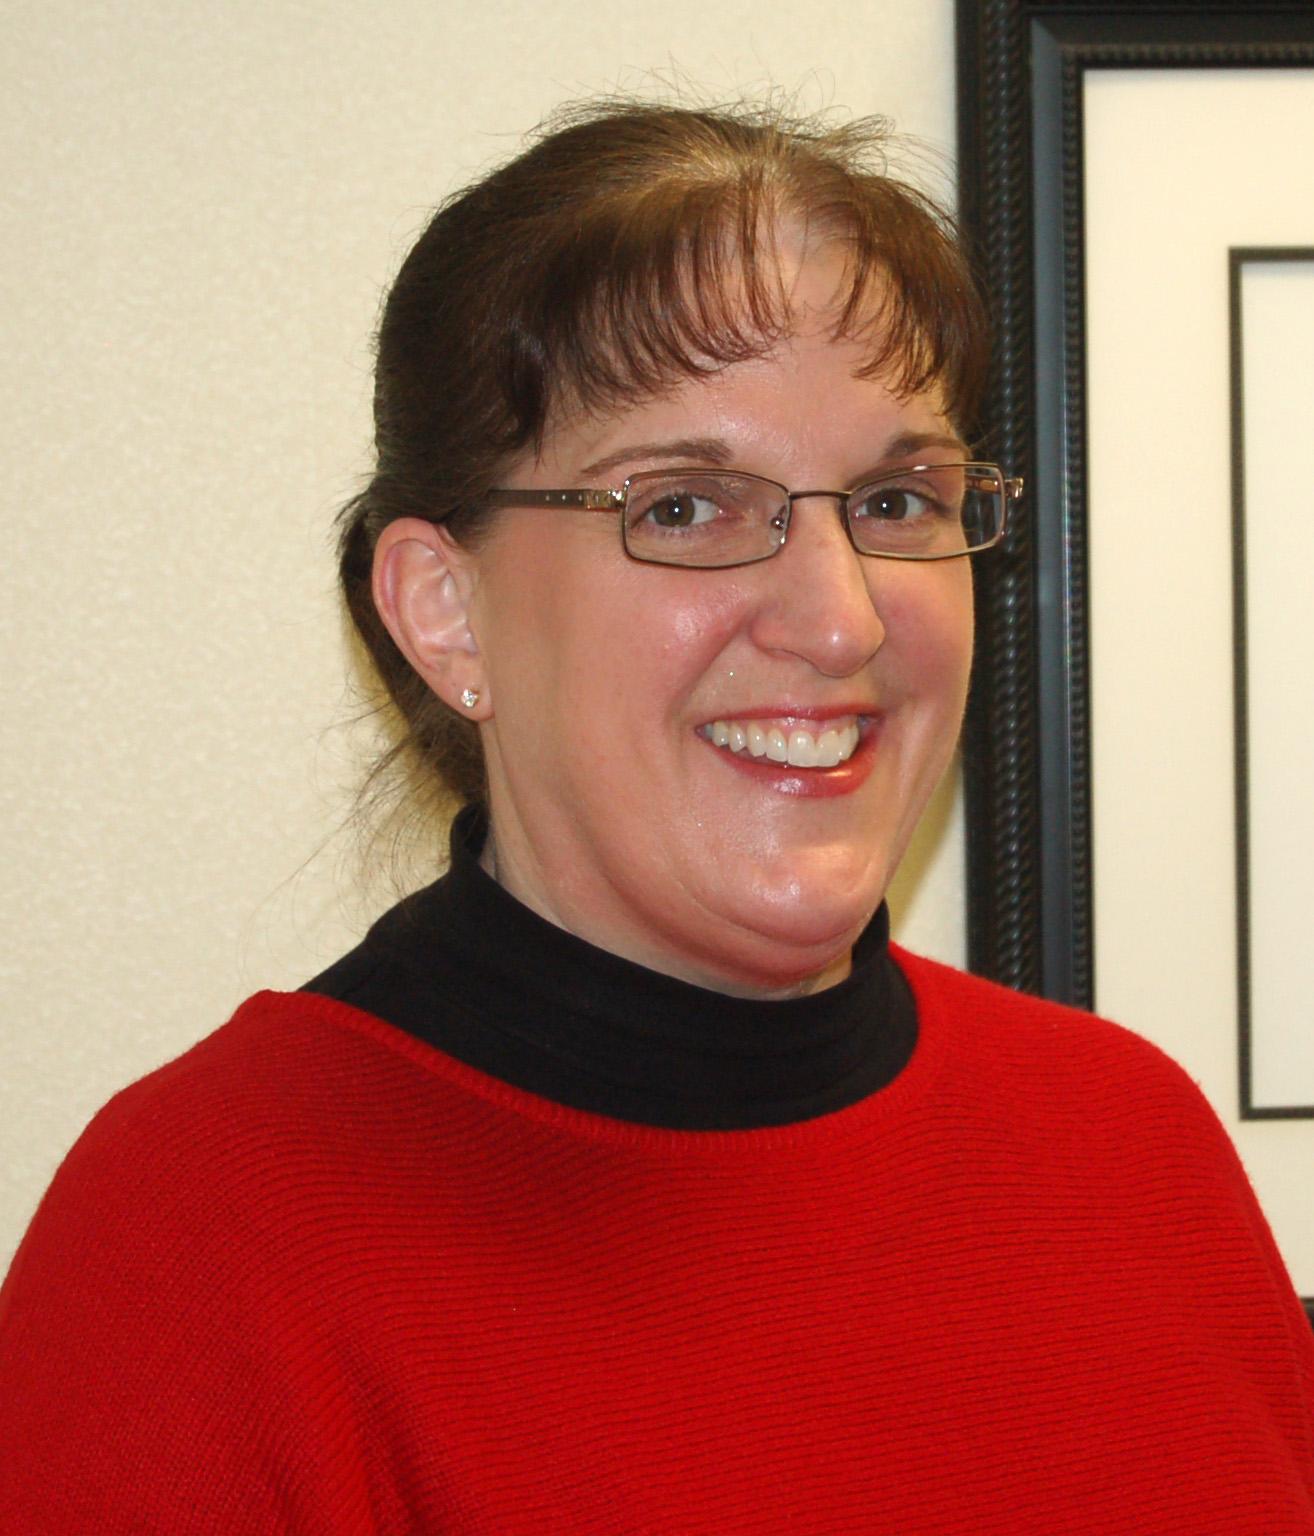 "<a href=""mailto:kerwin@summit-re.com"">Kathy Erwin</a>"